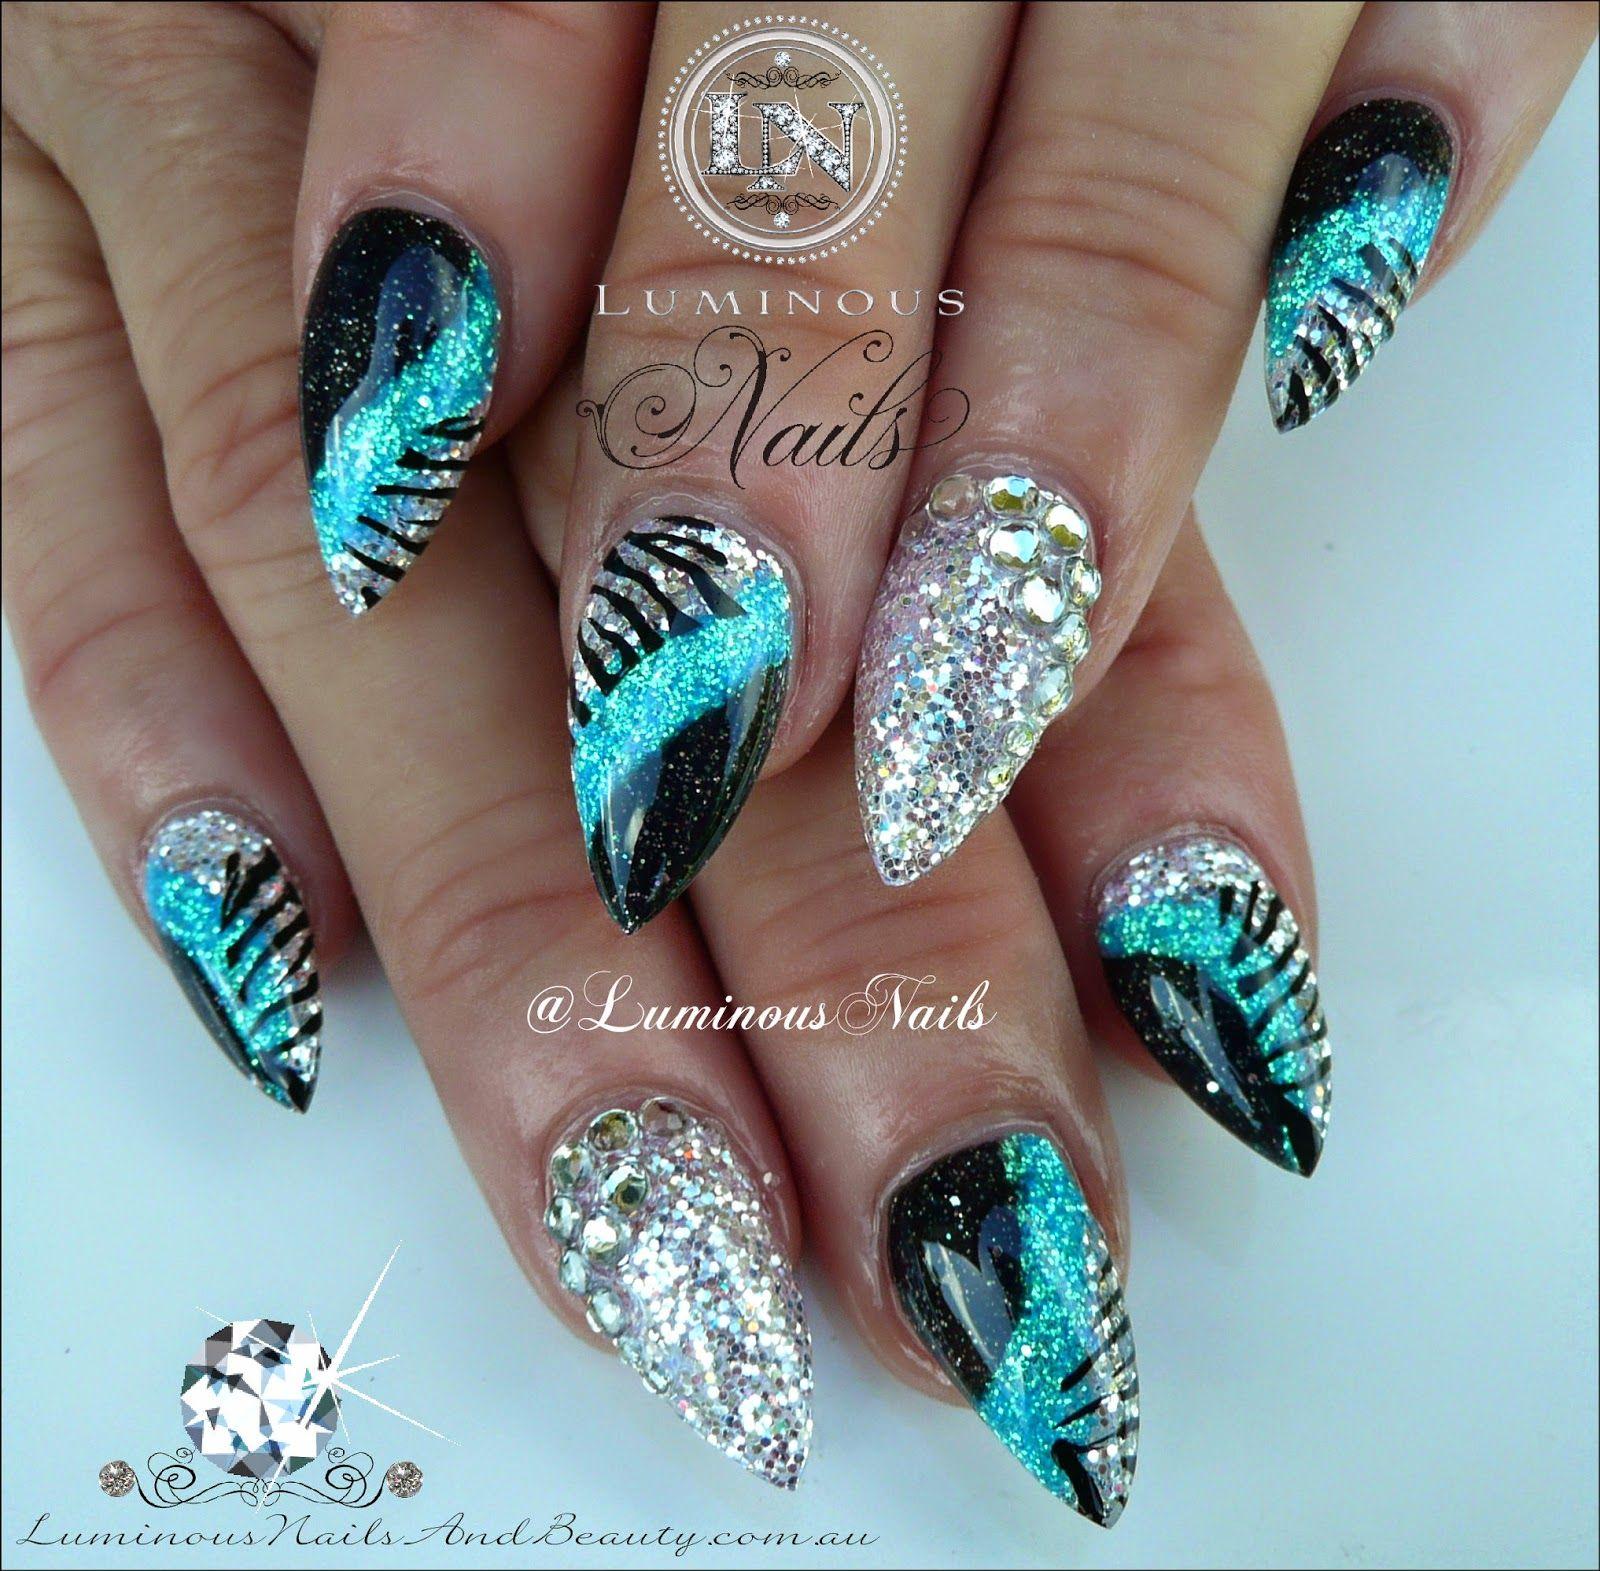 luminous nails: blue, silver & black acrylic nails with zebra